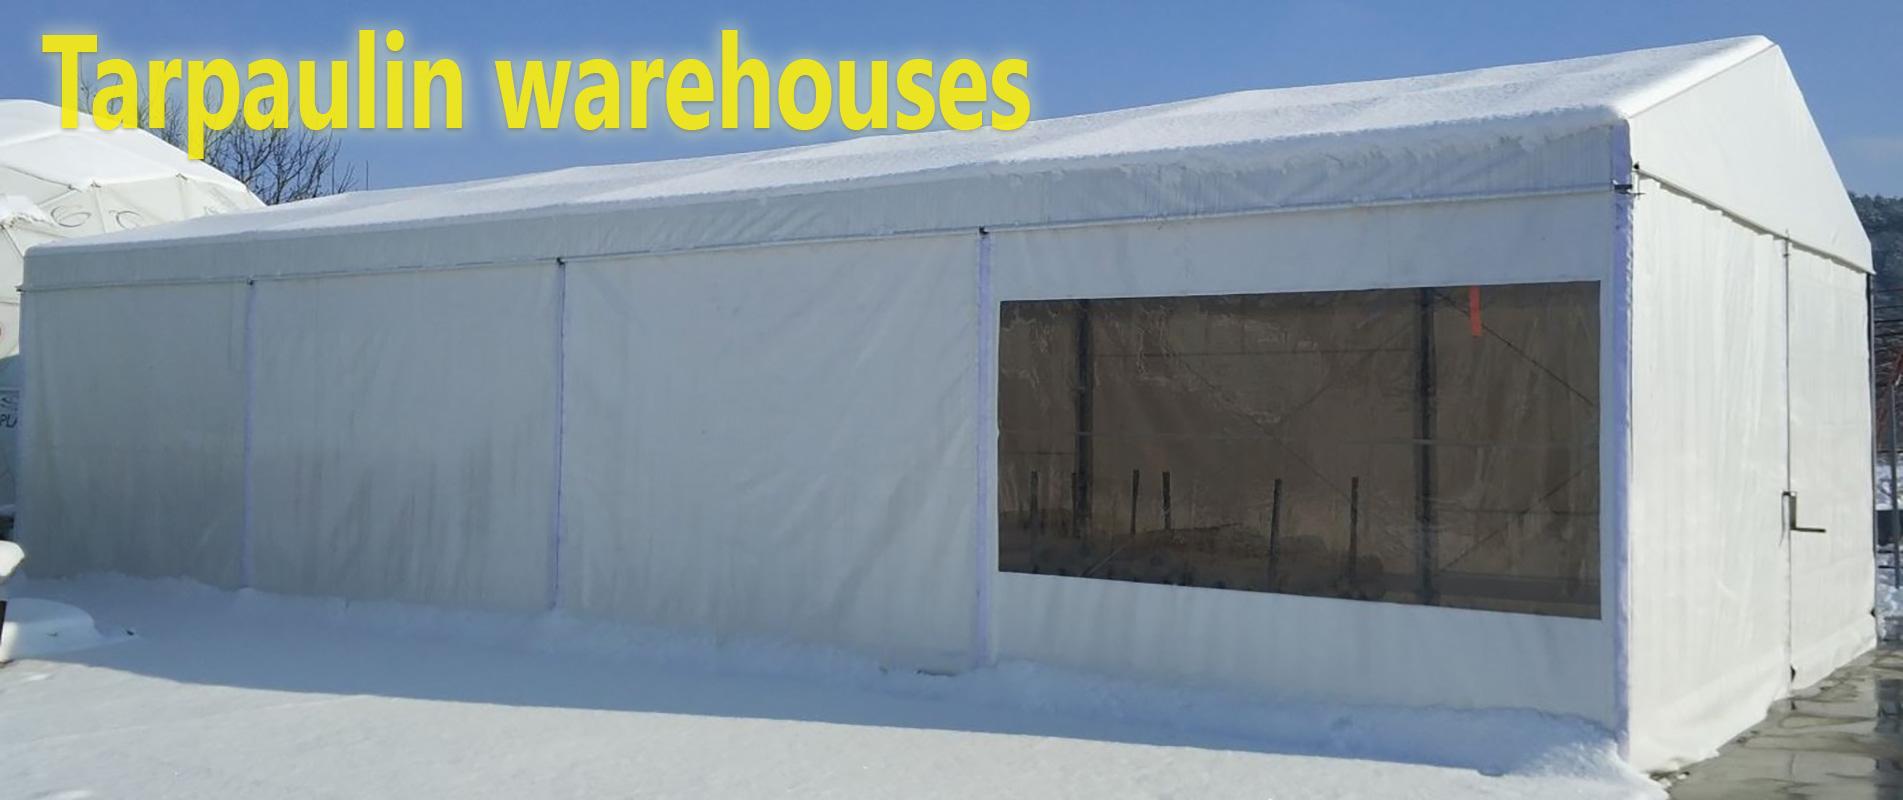 Tarpaulin Warehouses